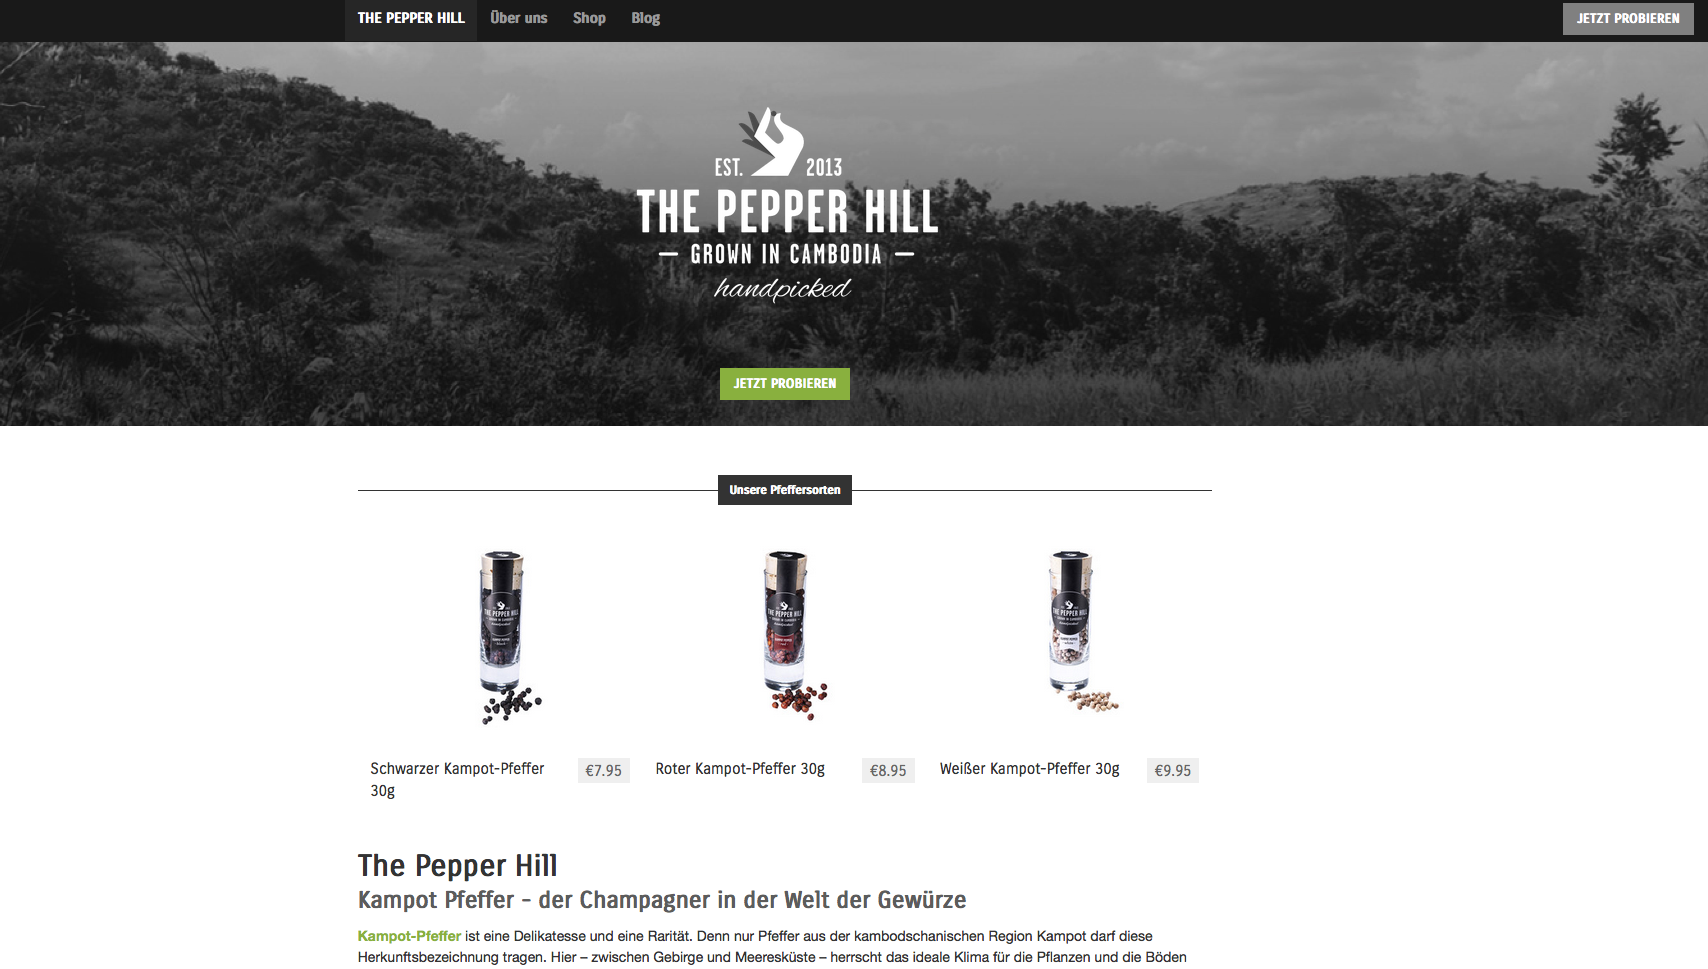 The Pepper Hill Gutschein